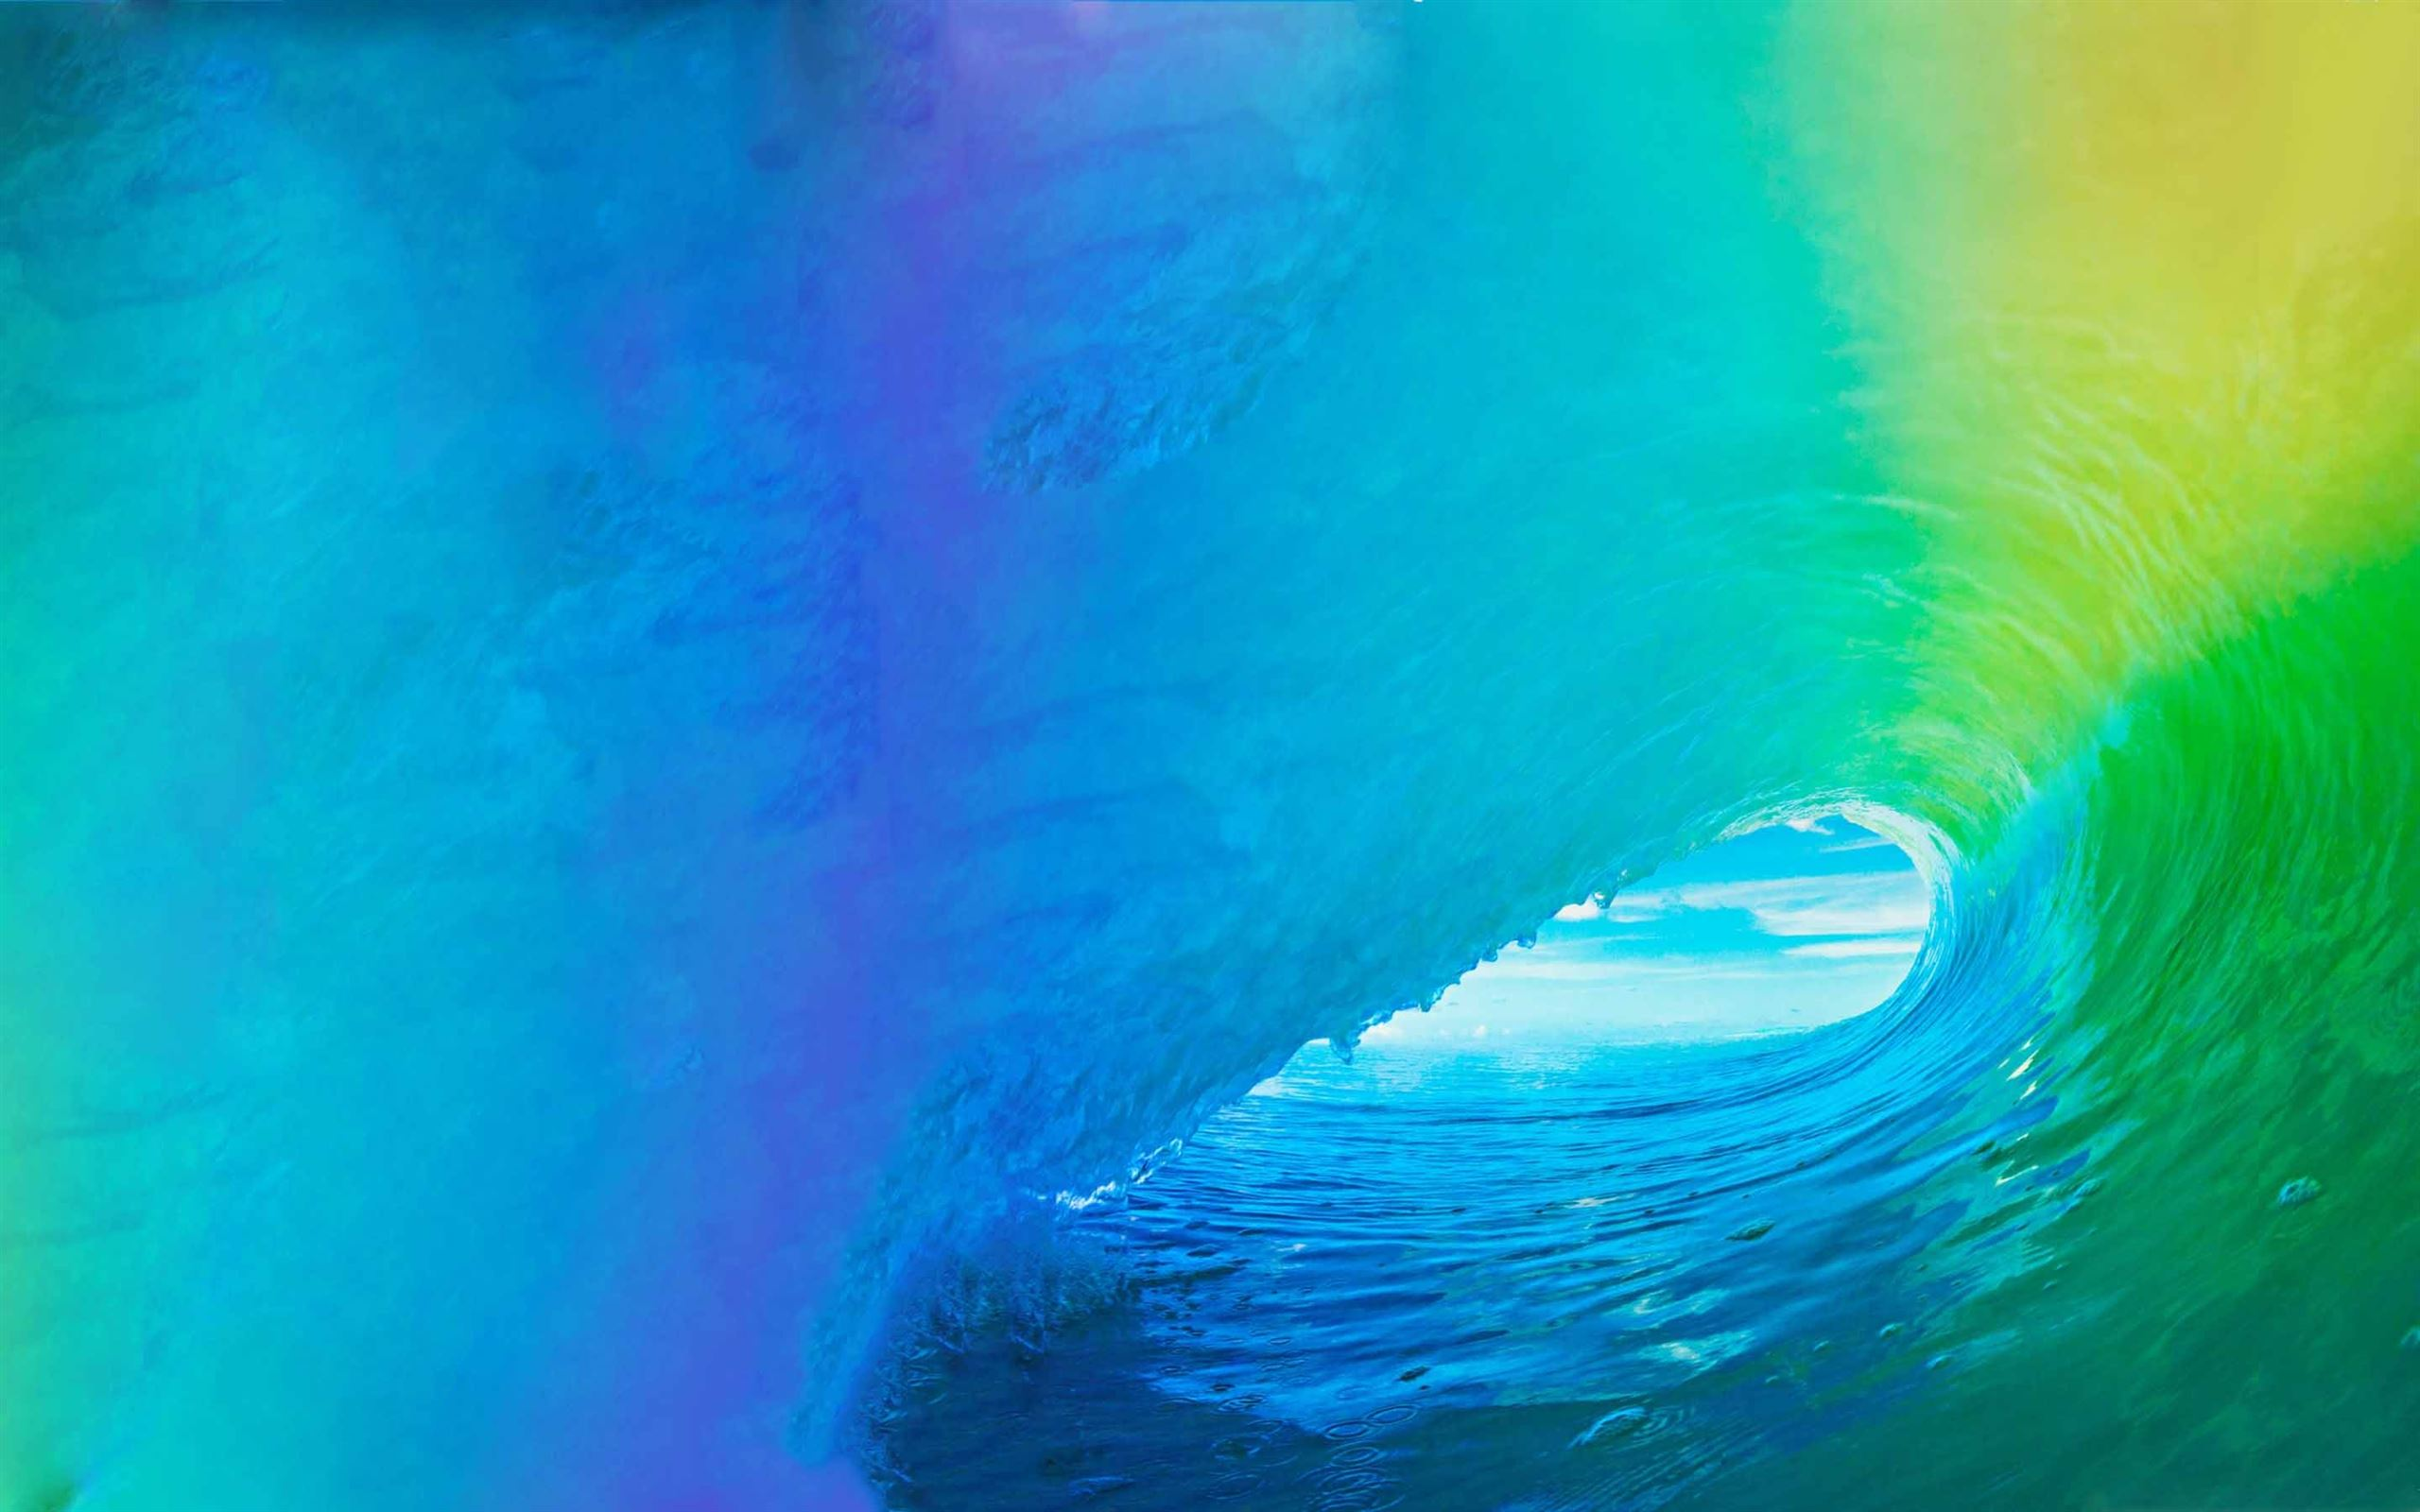 Wallpaper Iphone X Wallpaper Iphone 8 Ios 11 Colorful: The IOS Mac Wallpaper Download